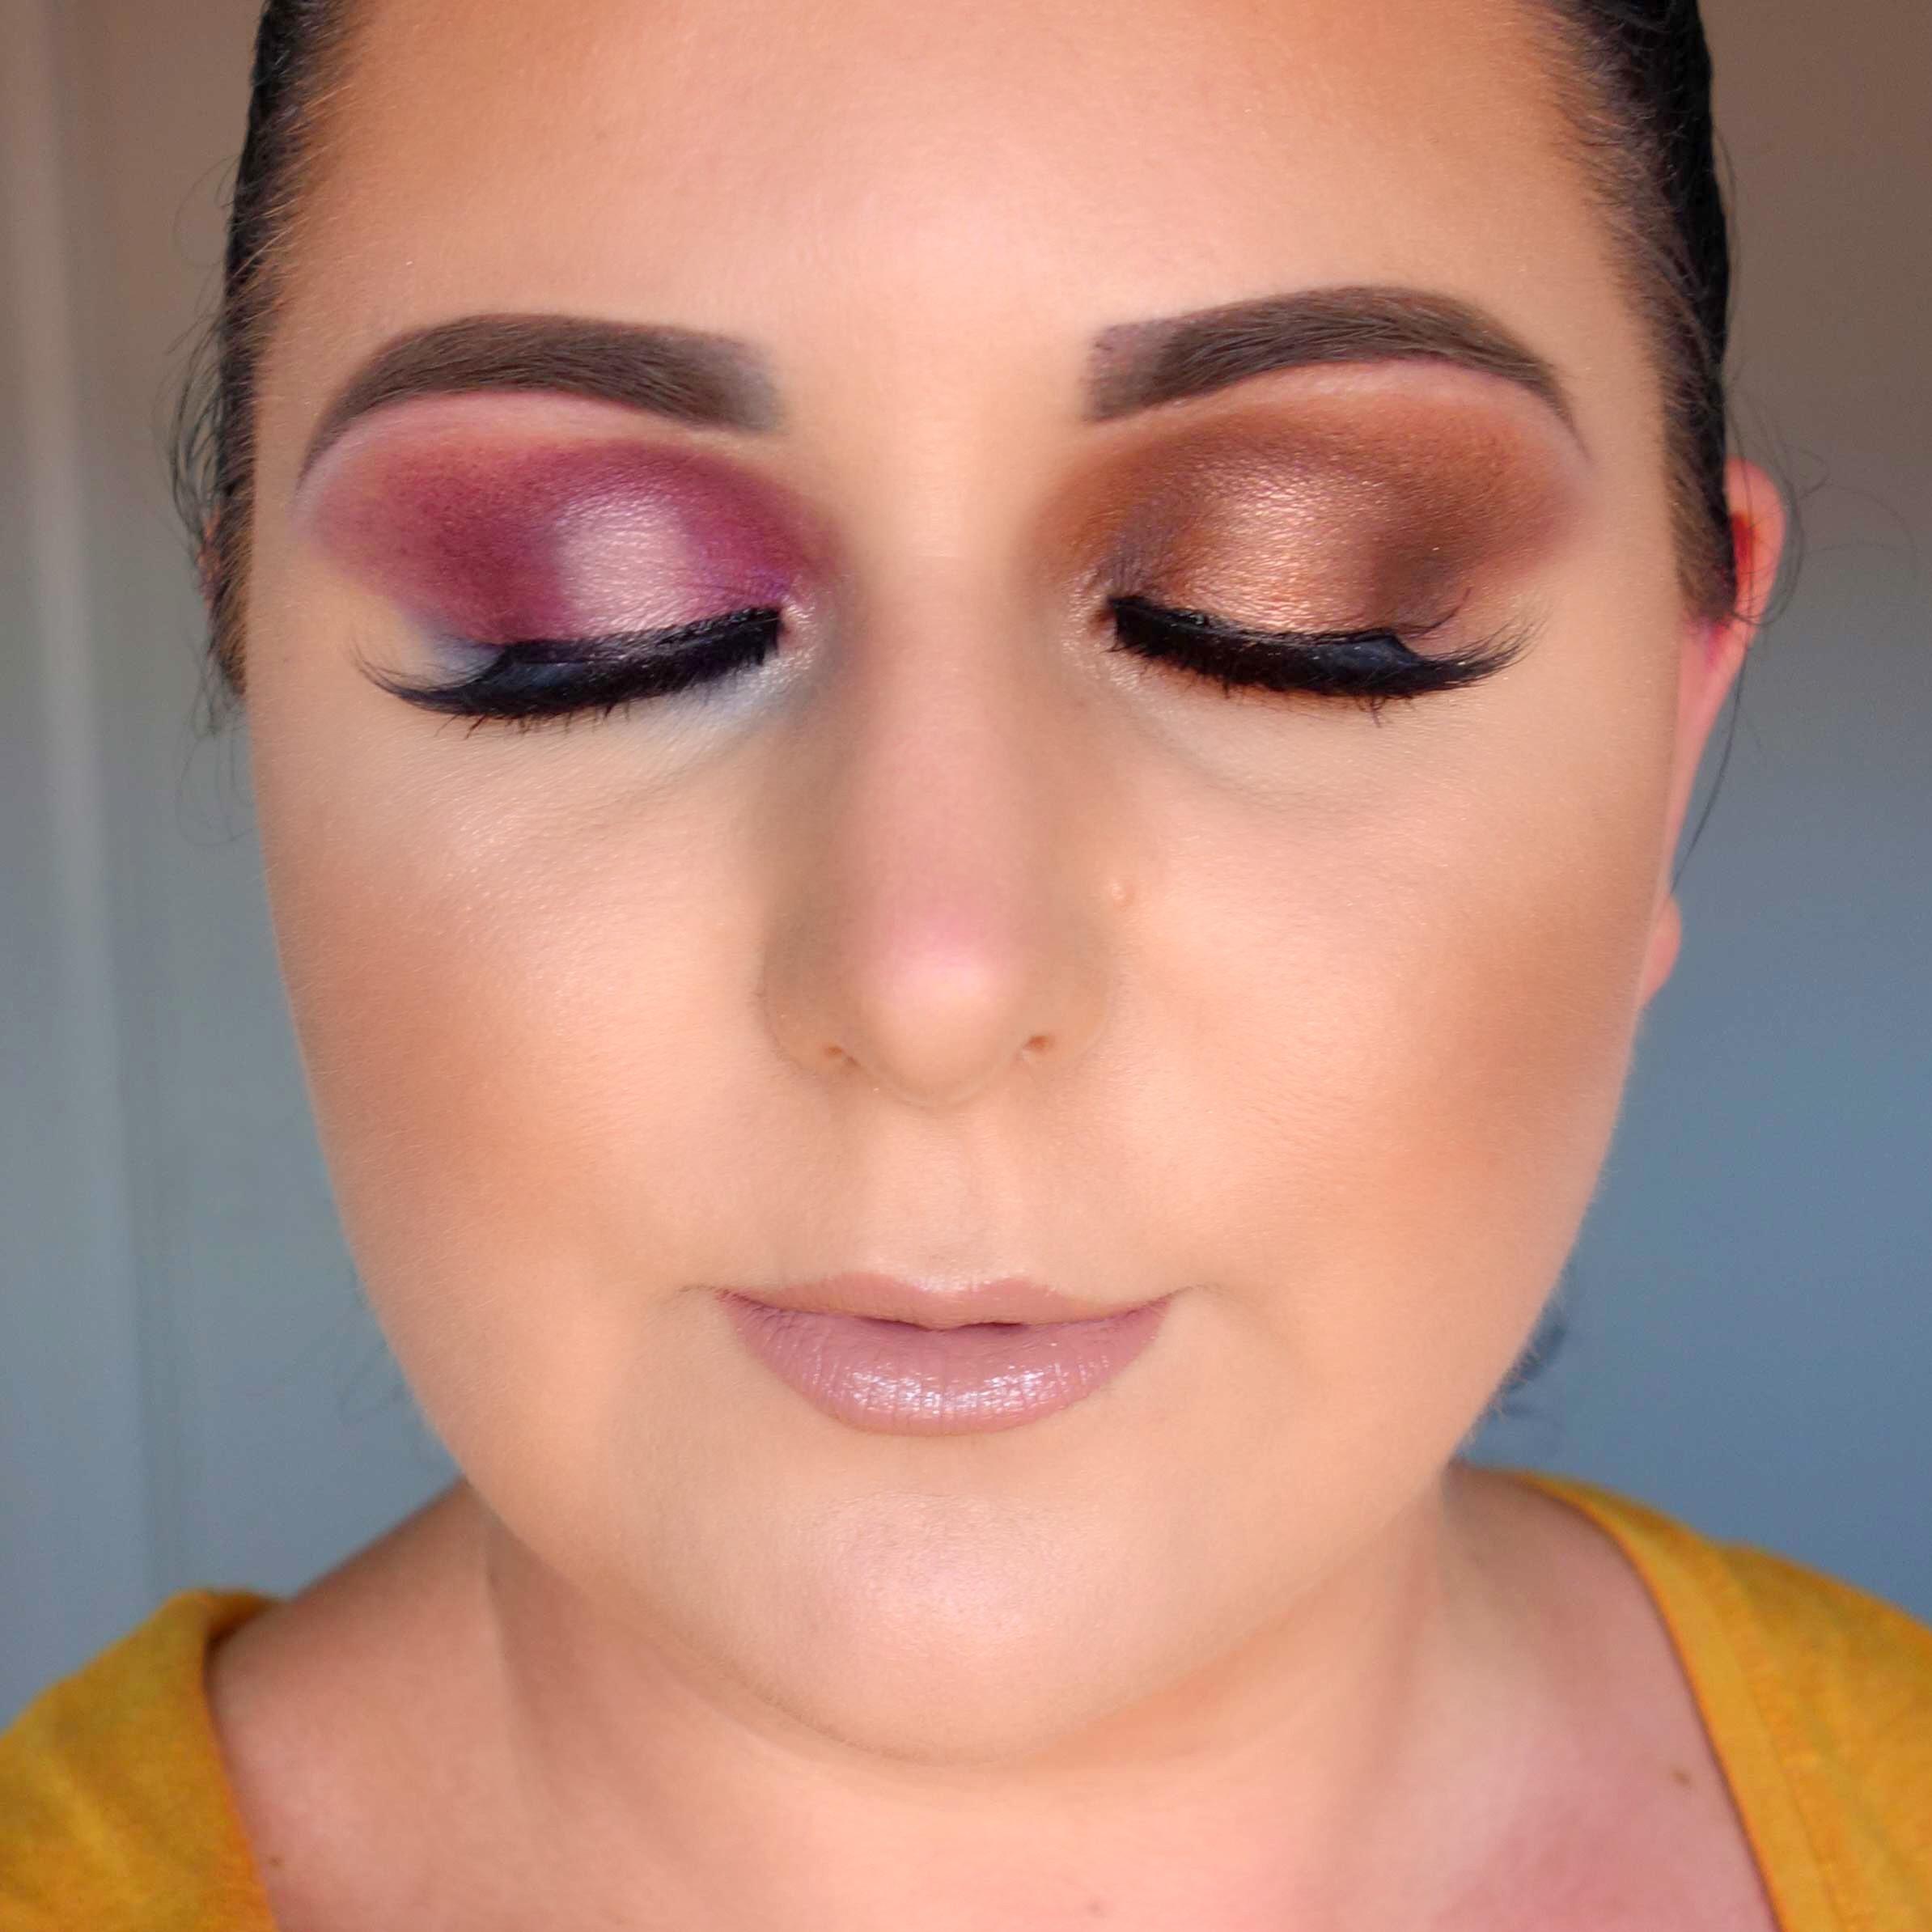 Australis GRLBOSS Eyeshadow Palette Review - Marisa Robinson Beauty